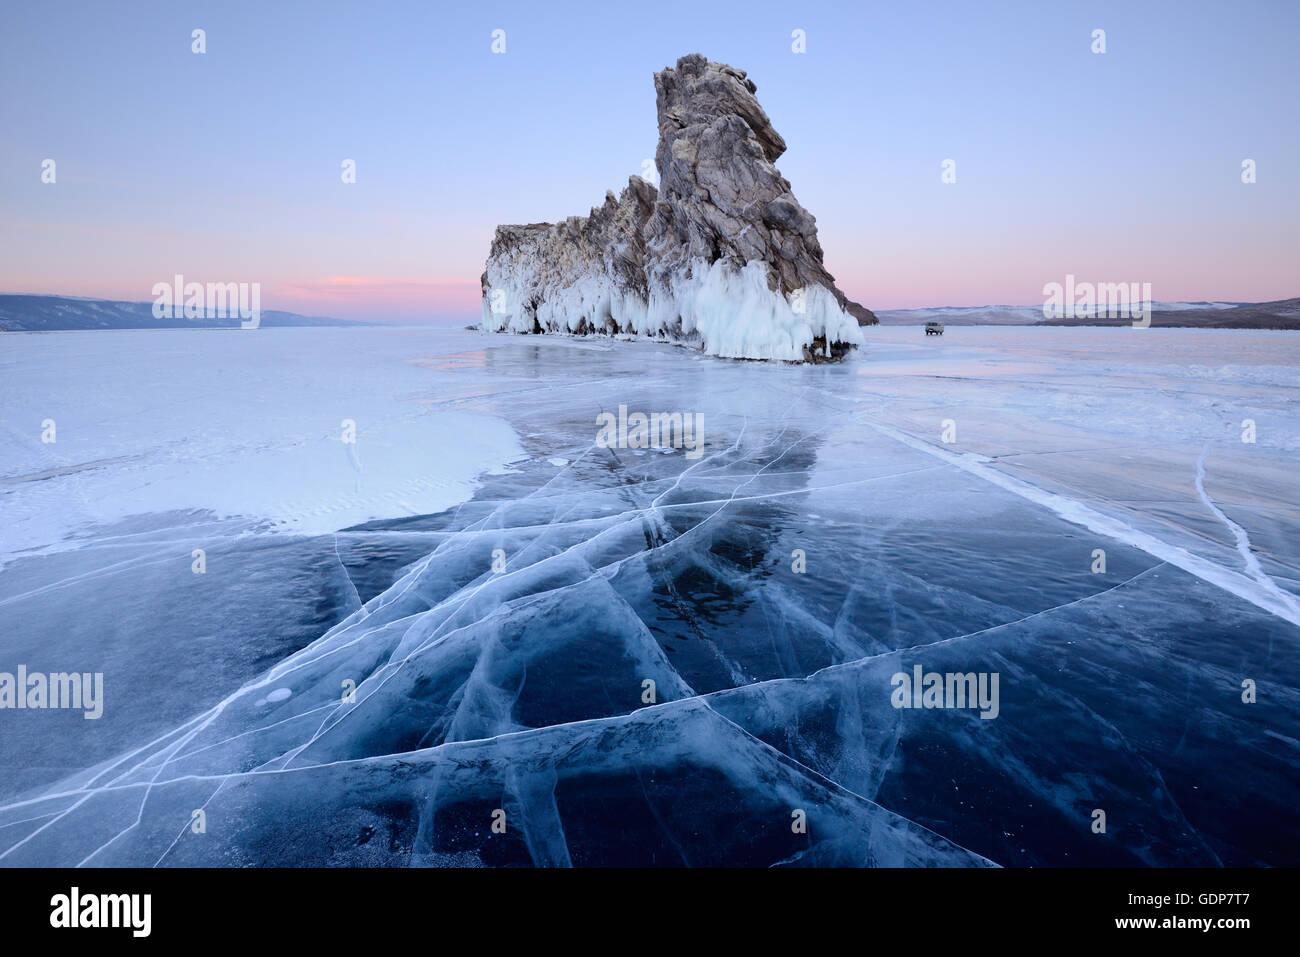 Ice and Ogoy Island, Baikal Lake, Olkhon Island, Siberia, Russia - Stock Image